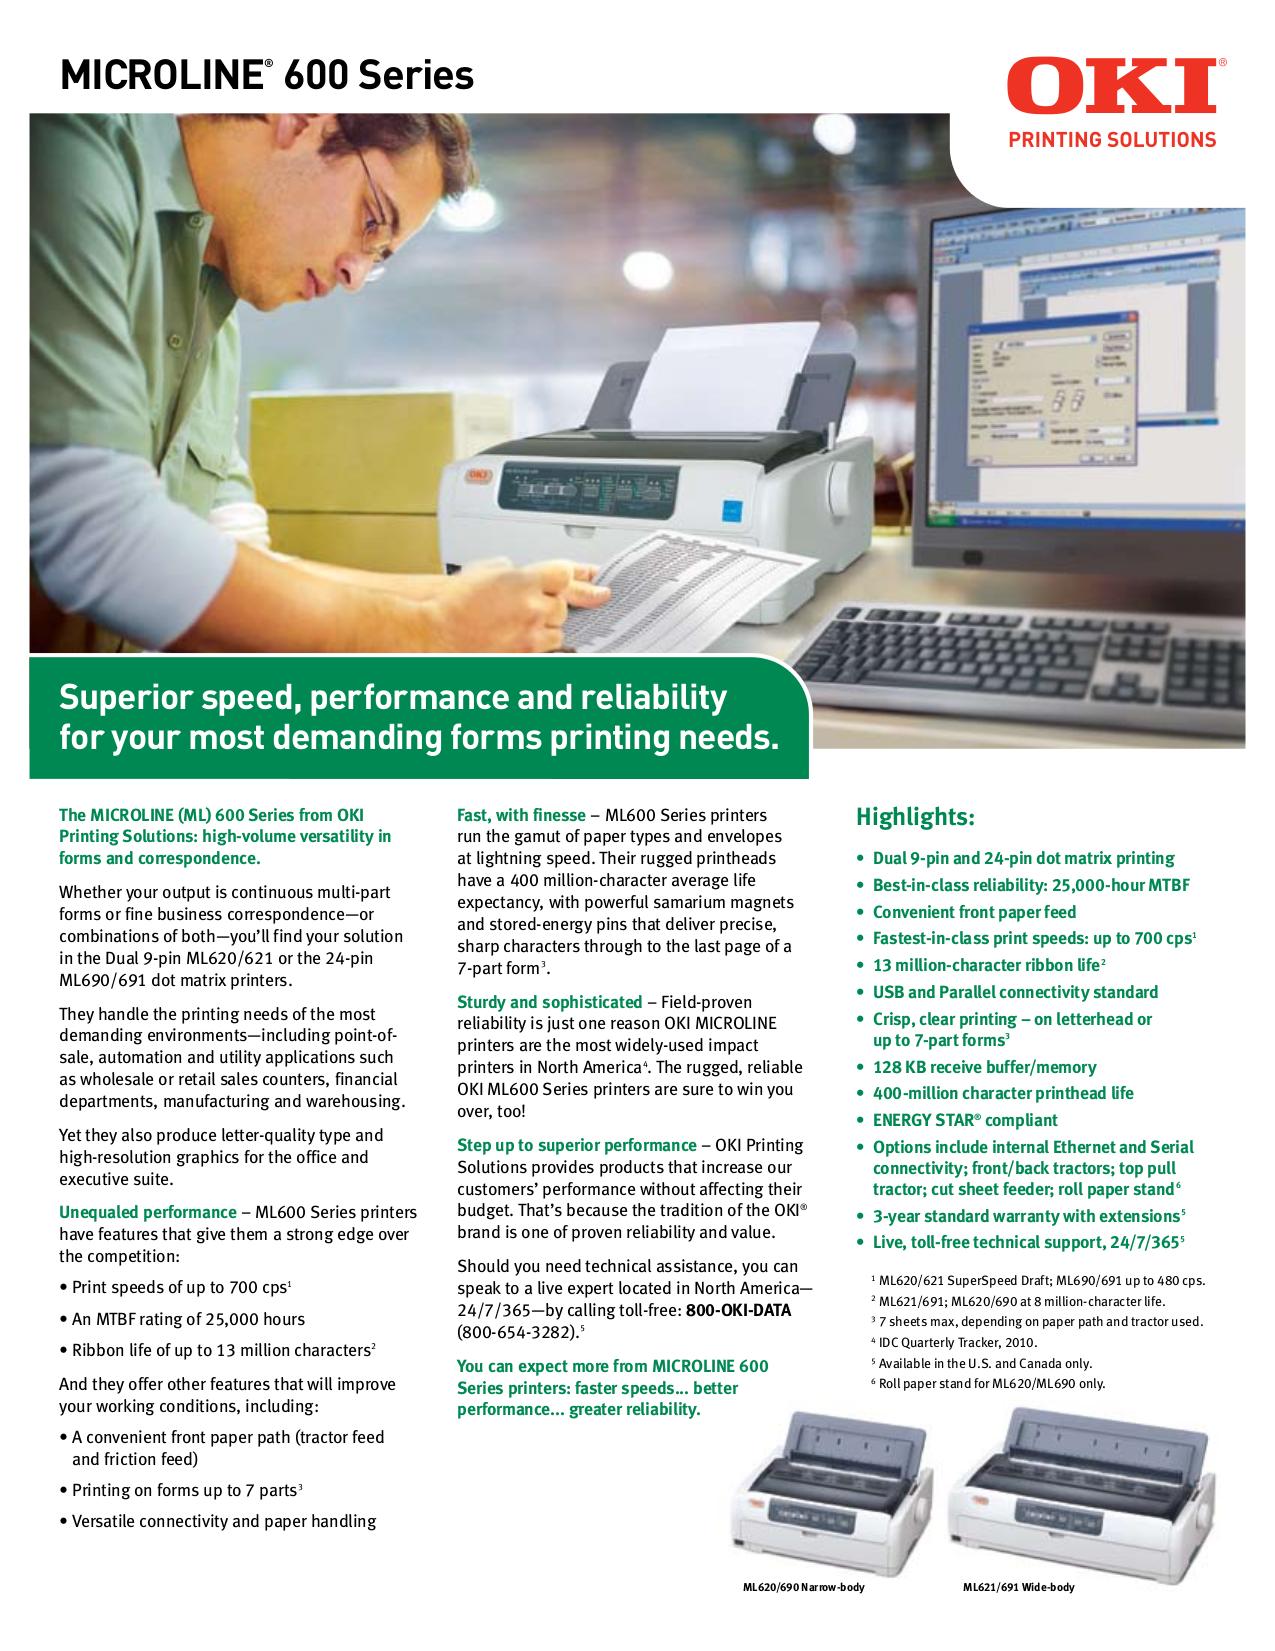 download free pdf for oki microline ml620 printer manual oki mc342 printer manual oki b4400 printer manual